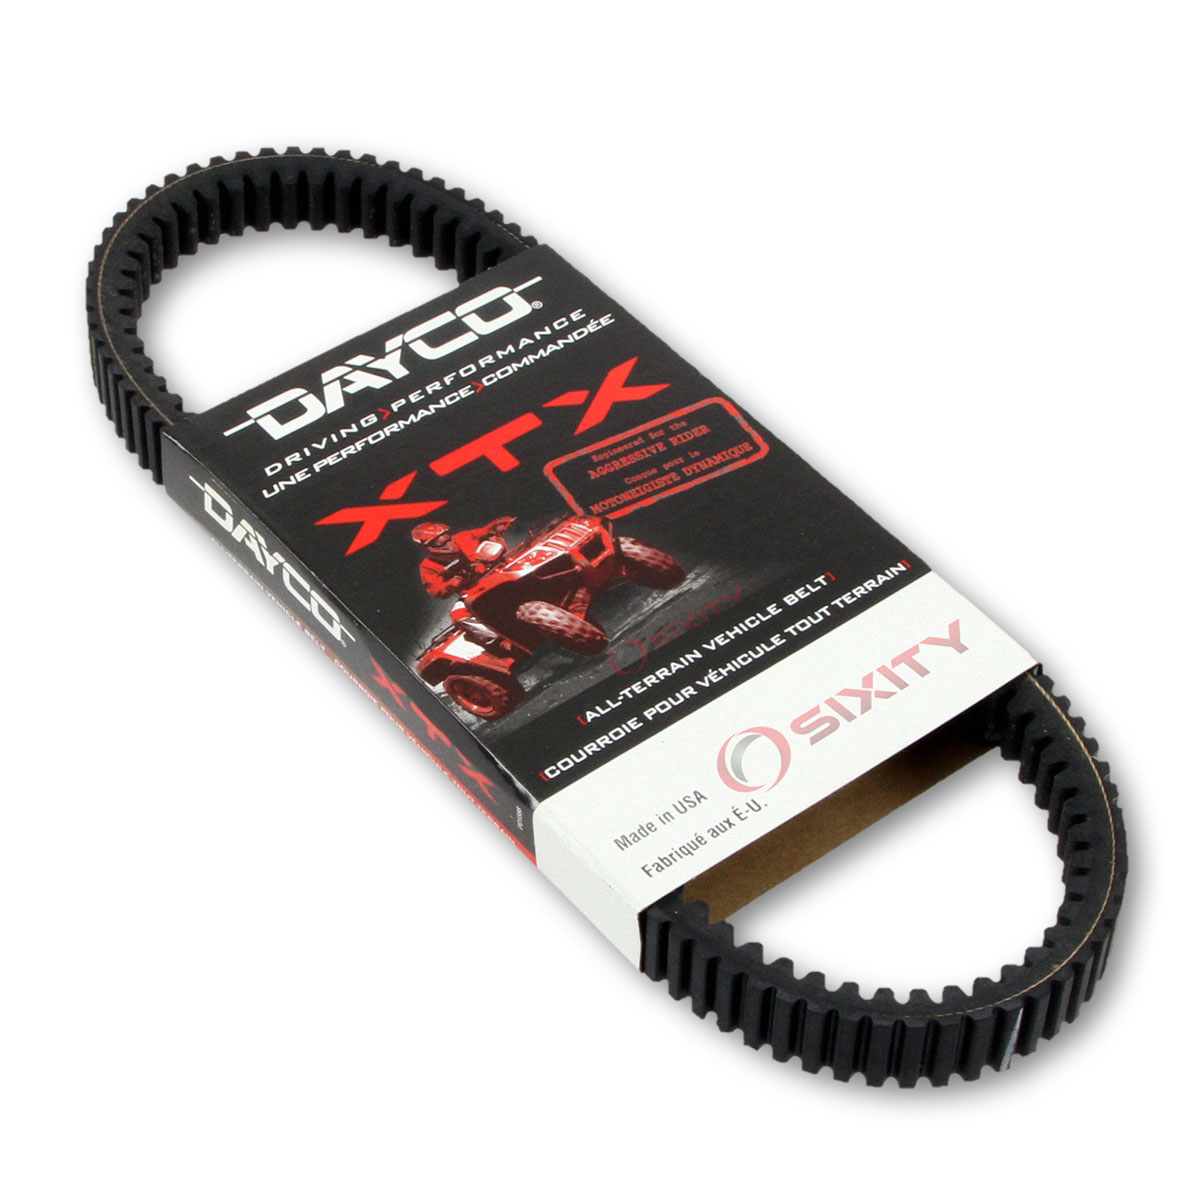 Gates Drive Belt 2013-2015 Can-Am Maverick Max 1000R G-Force CVT Heavy Duty nv